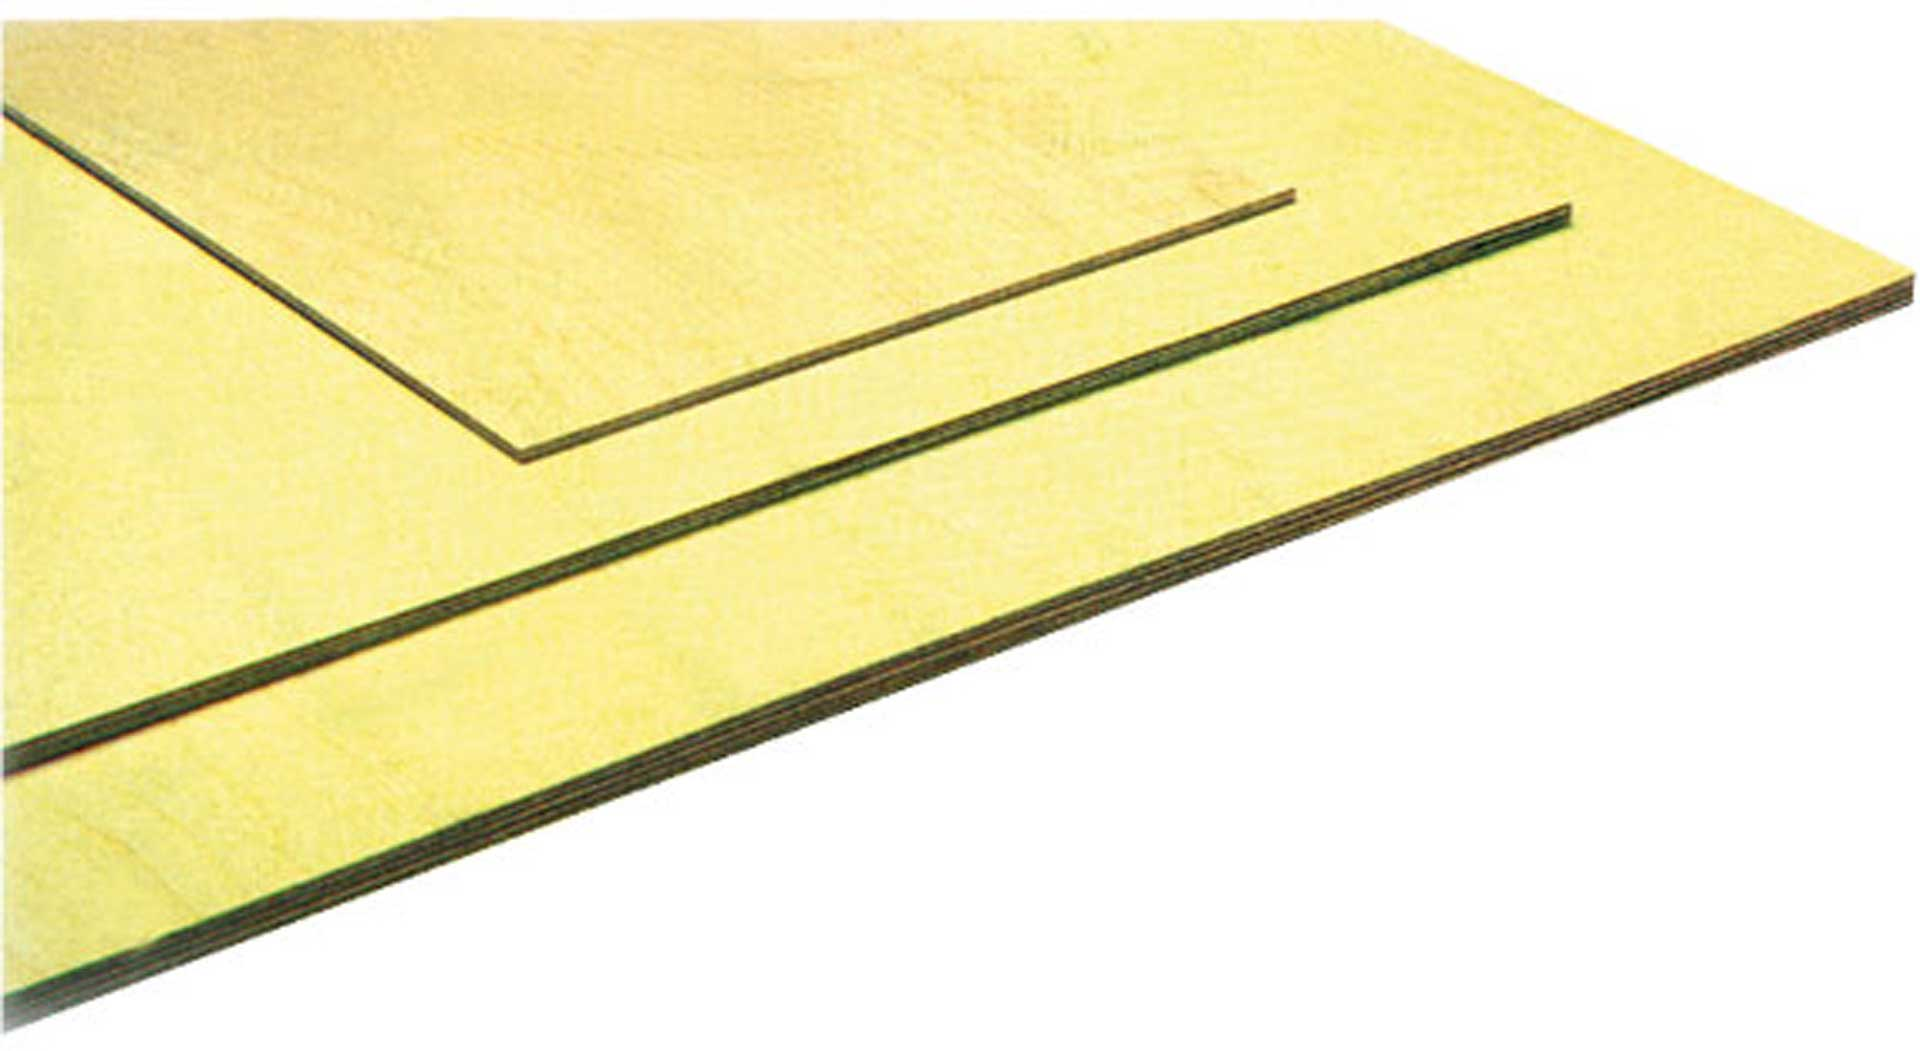 MODELLBAU LINDINGER BIRCH-SPERRY 0,4/300/500MM